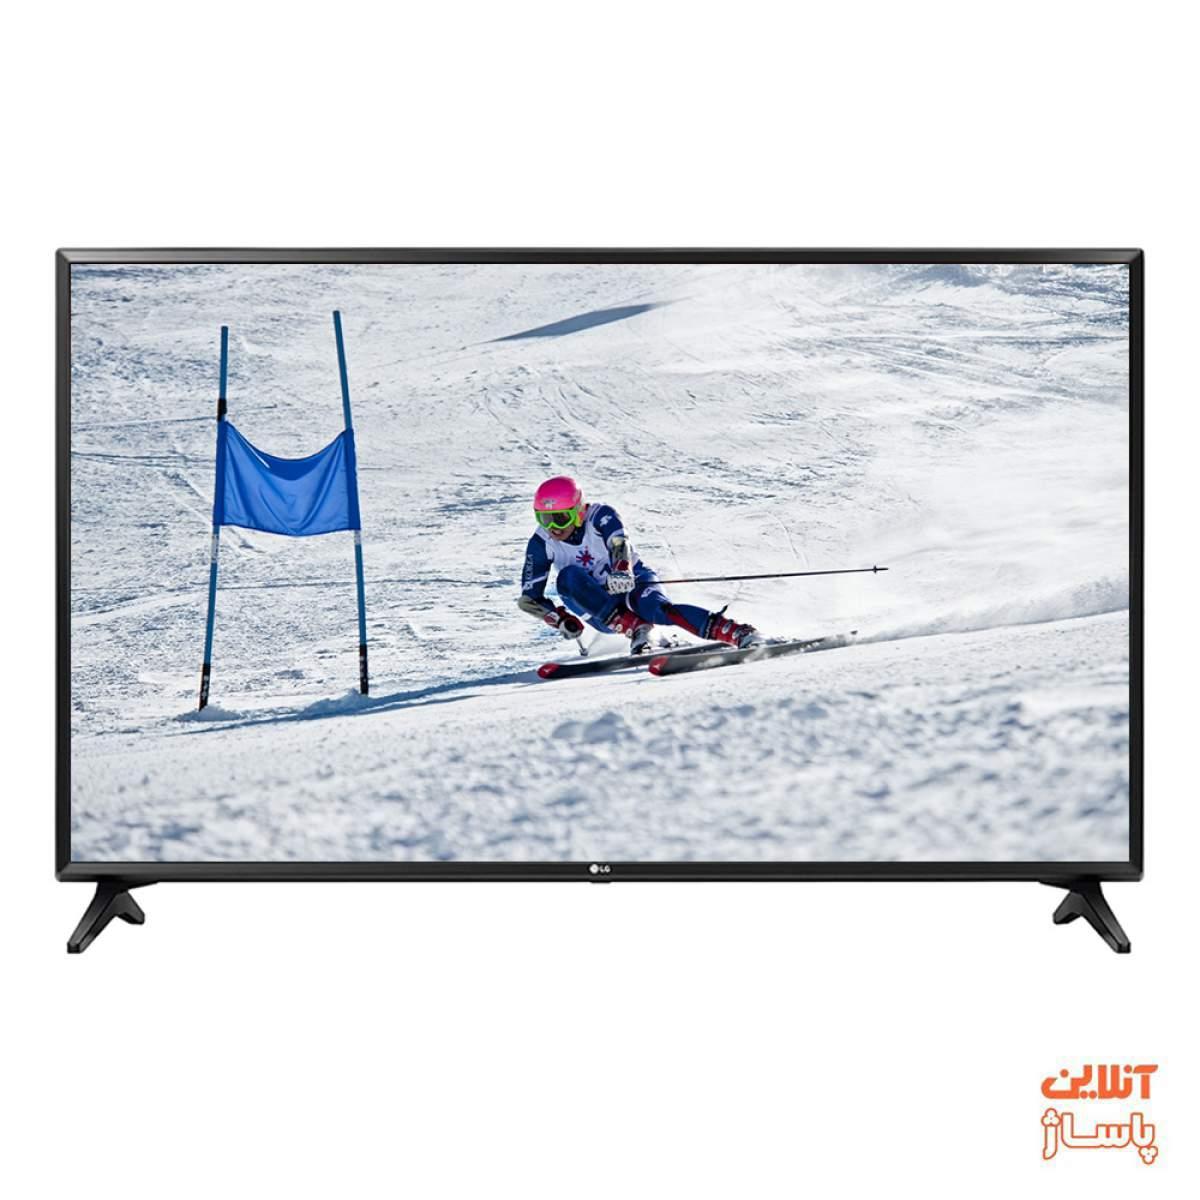 تلویزیون ال ای دی هوشمند ال جی مدل 55LJ55000GI سایز ۵۵ اینچ